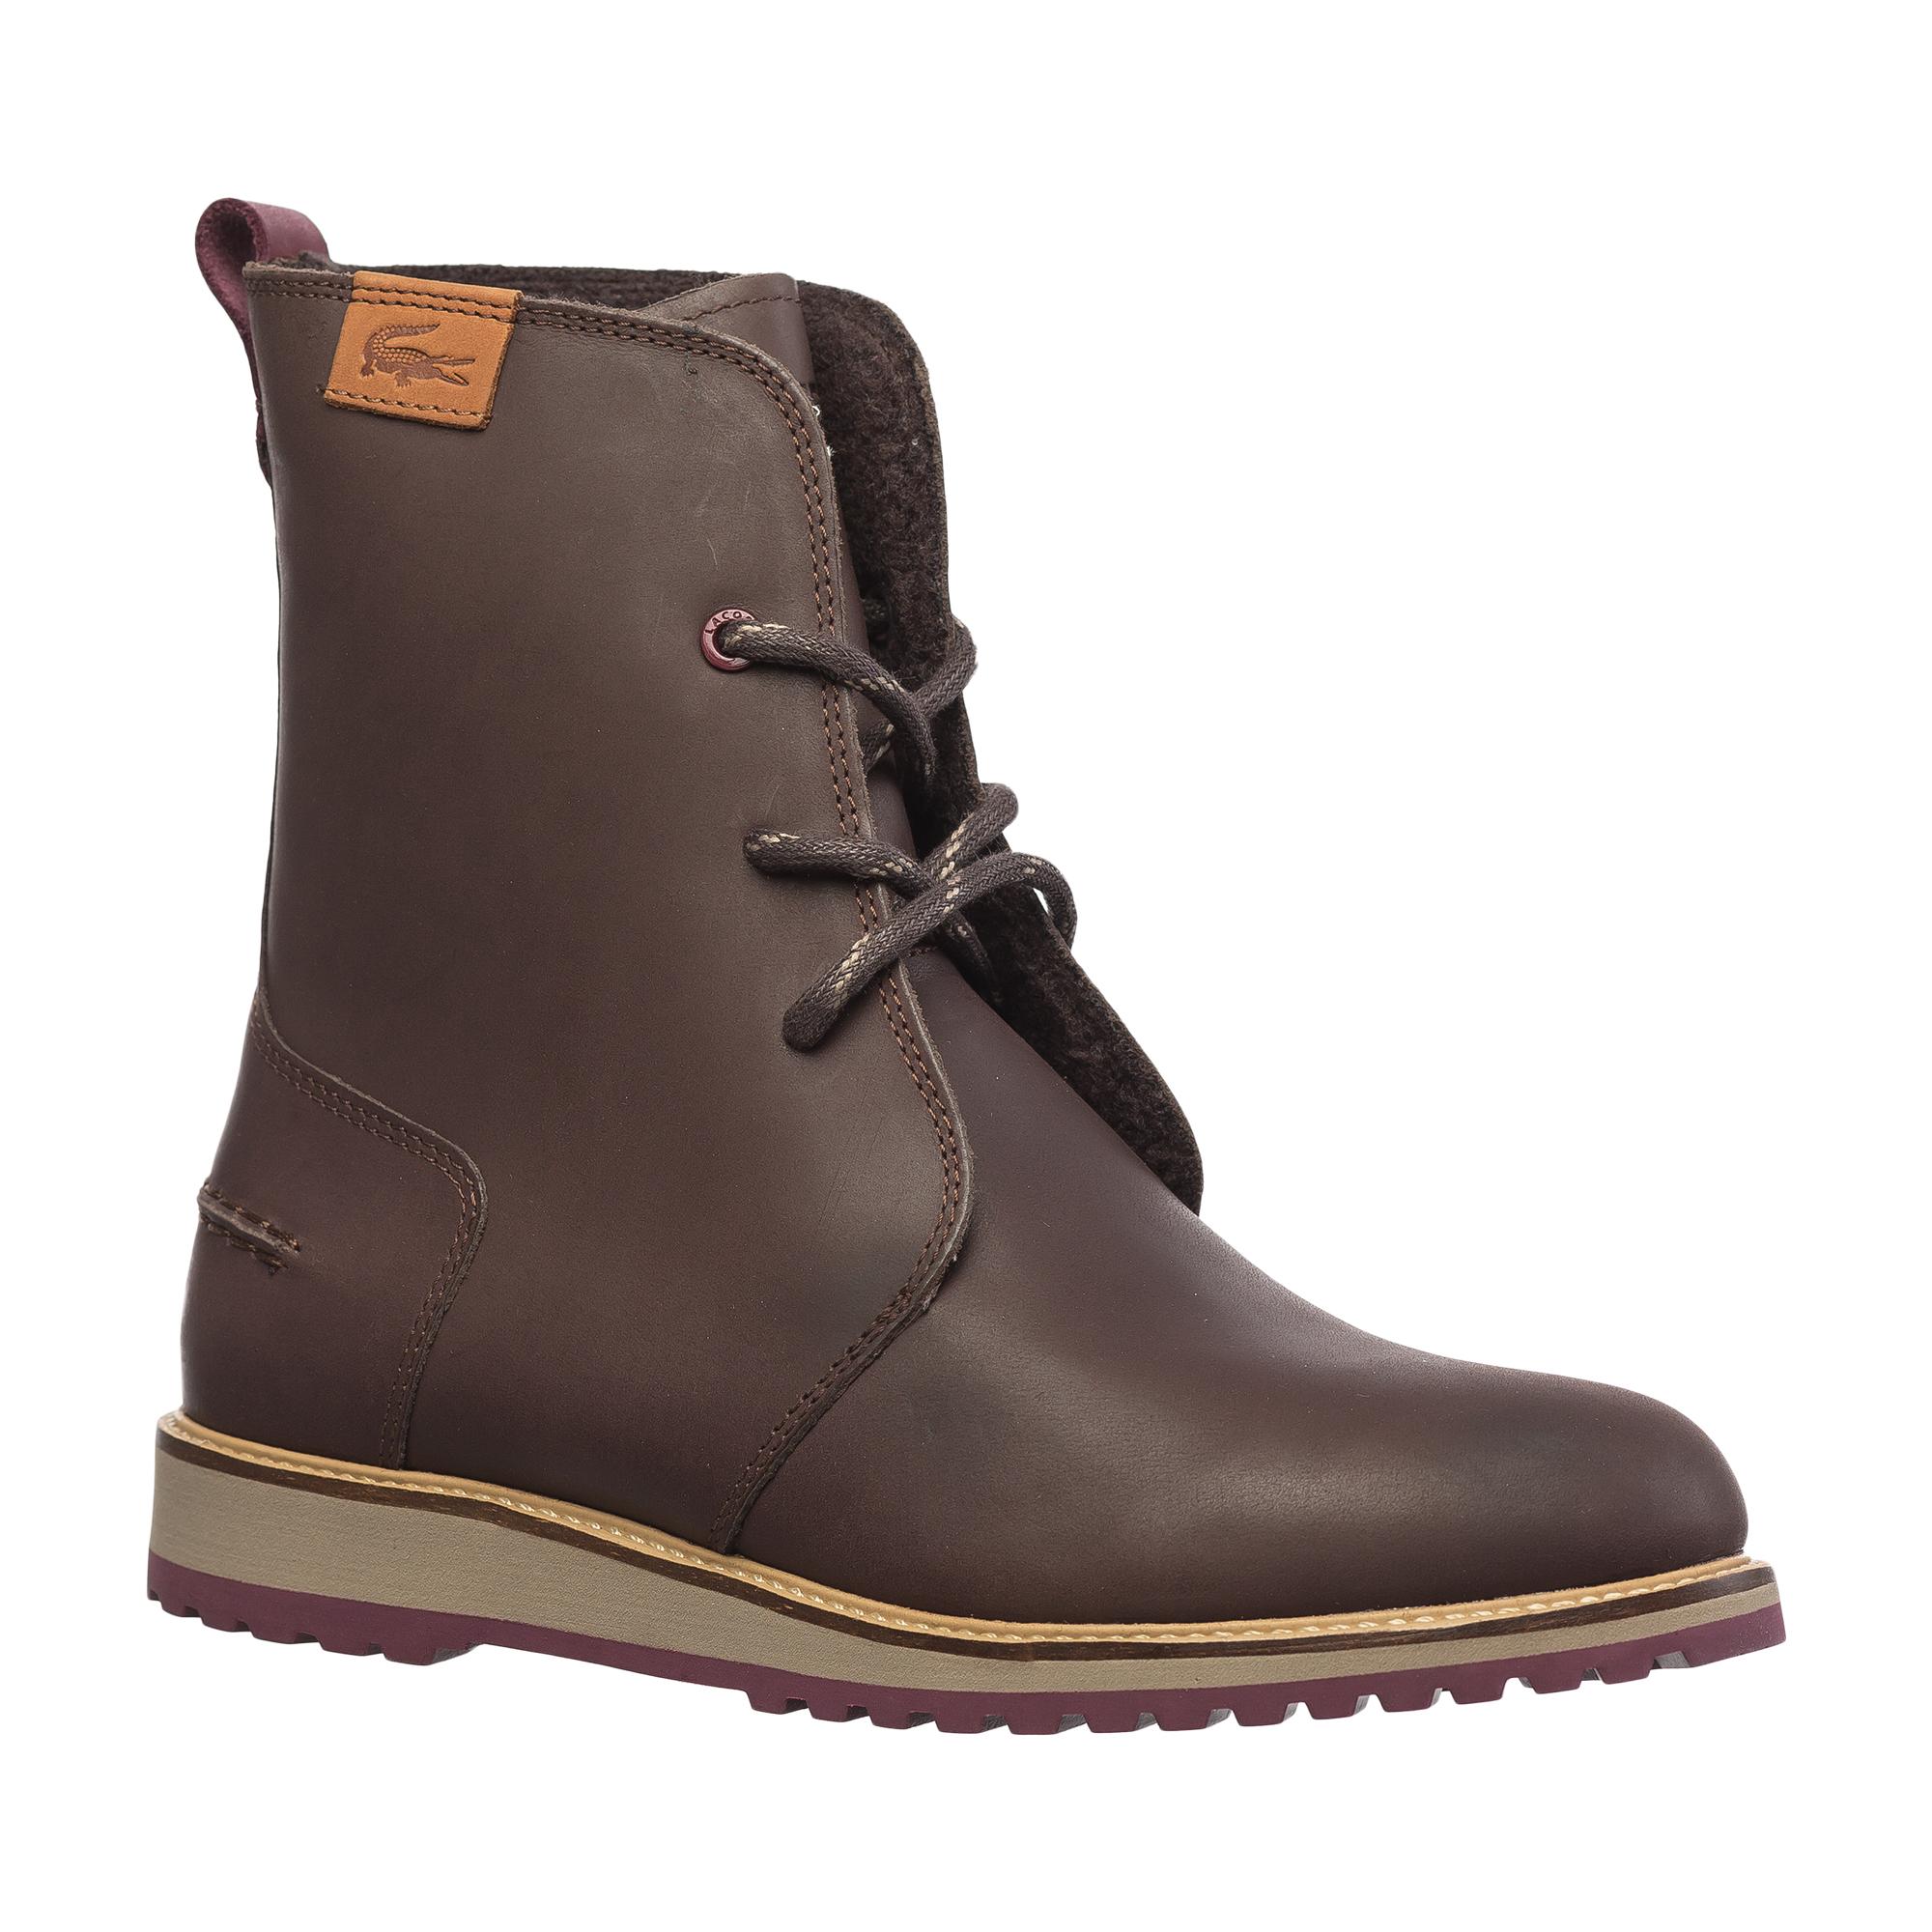 женские ботинки lacoste, коричневые